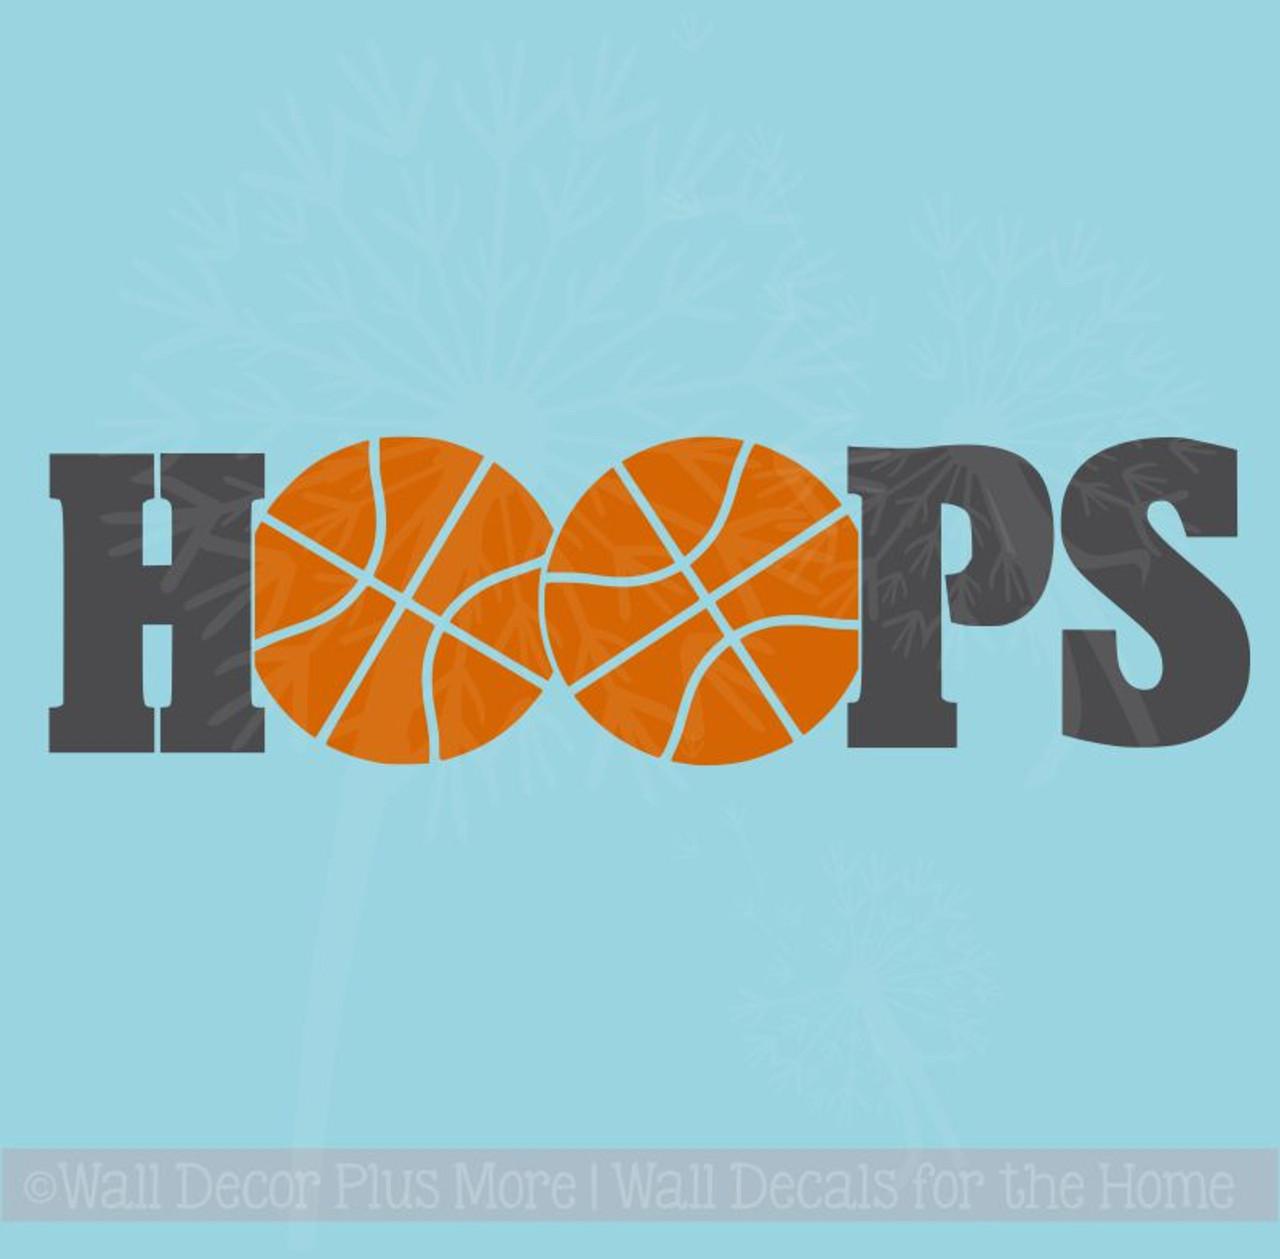 HOOPS Basketball Vinyl Lettering Wall Sticker Art Teen Sports Decals  Bedroom Decor